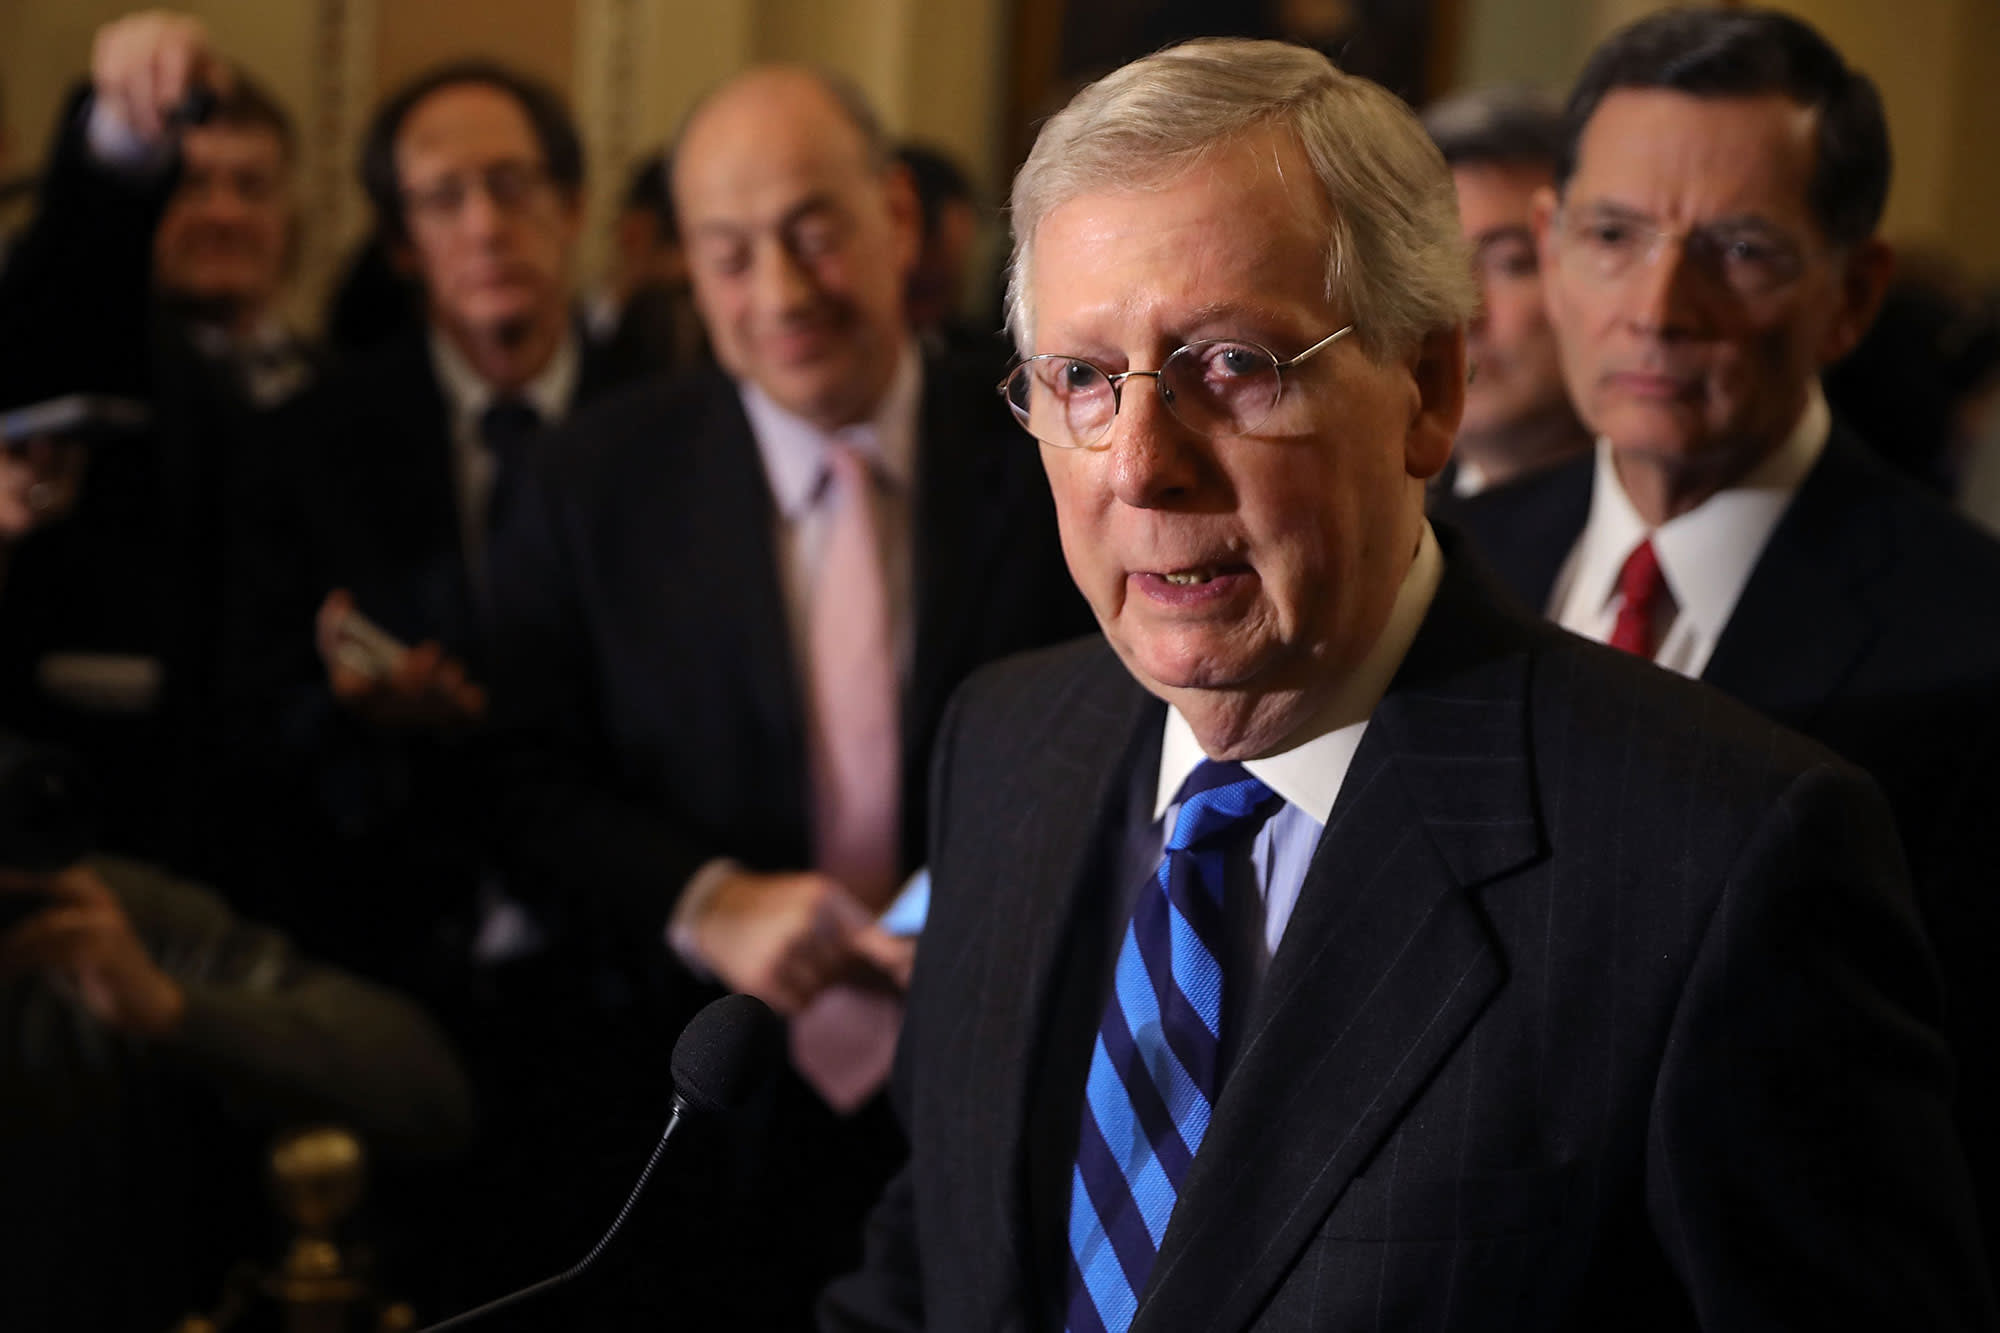 Senate leaders reach funding deal as shutdown looms